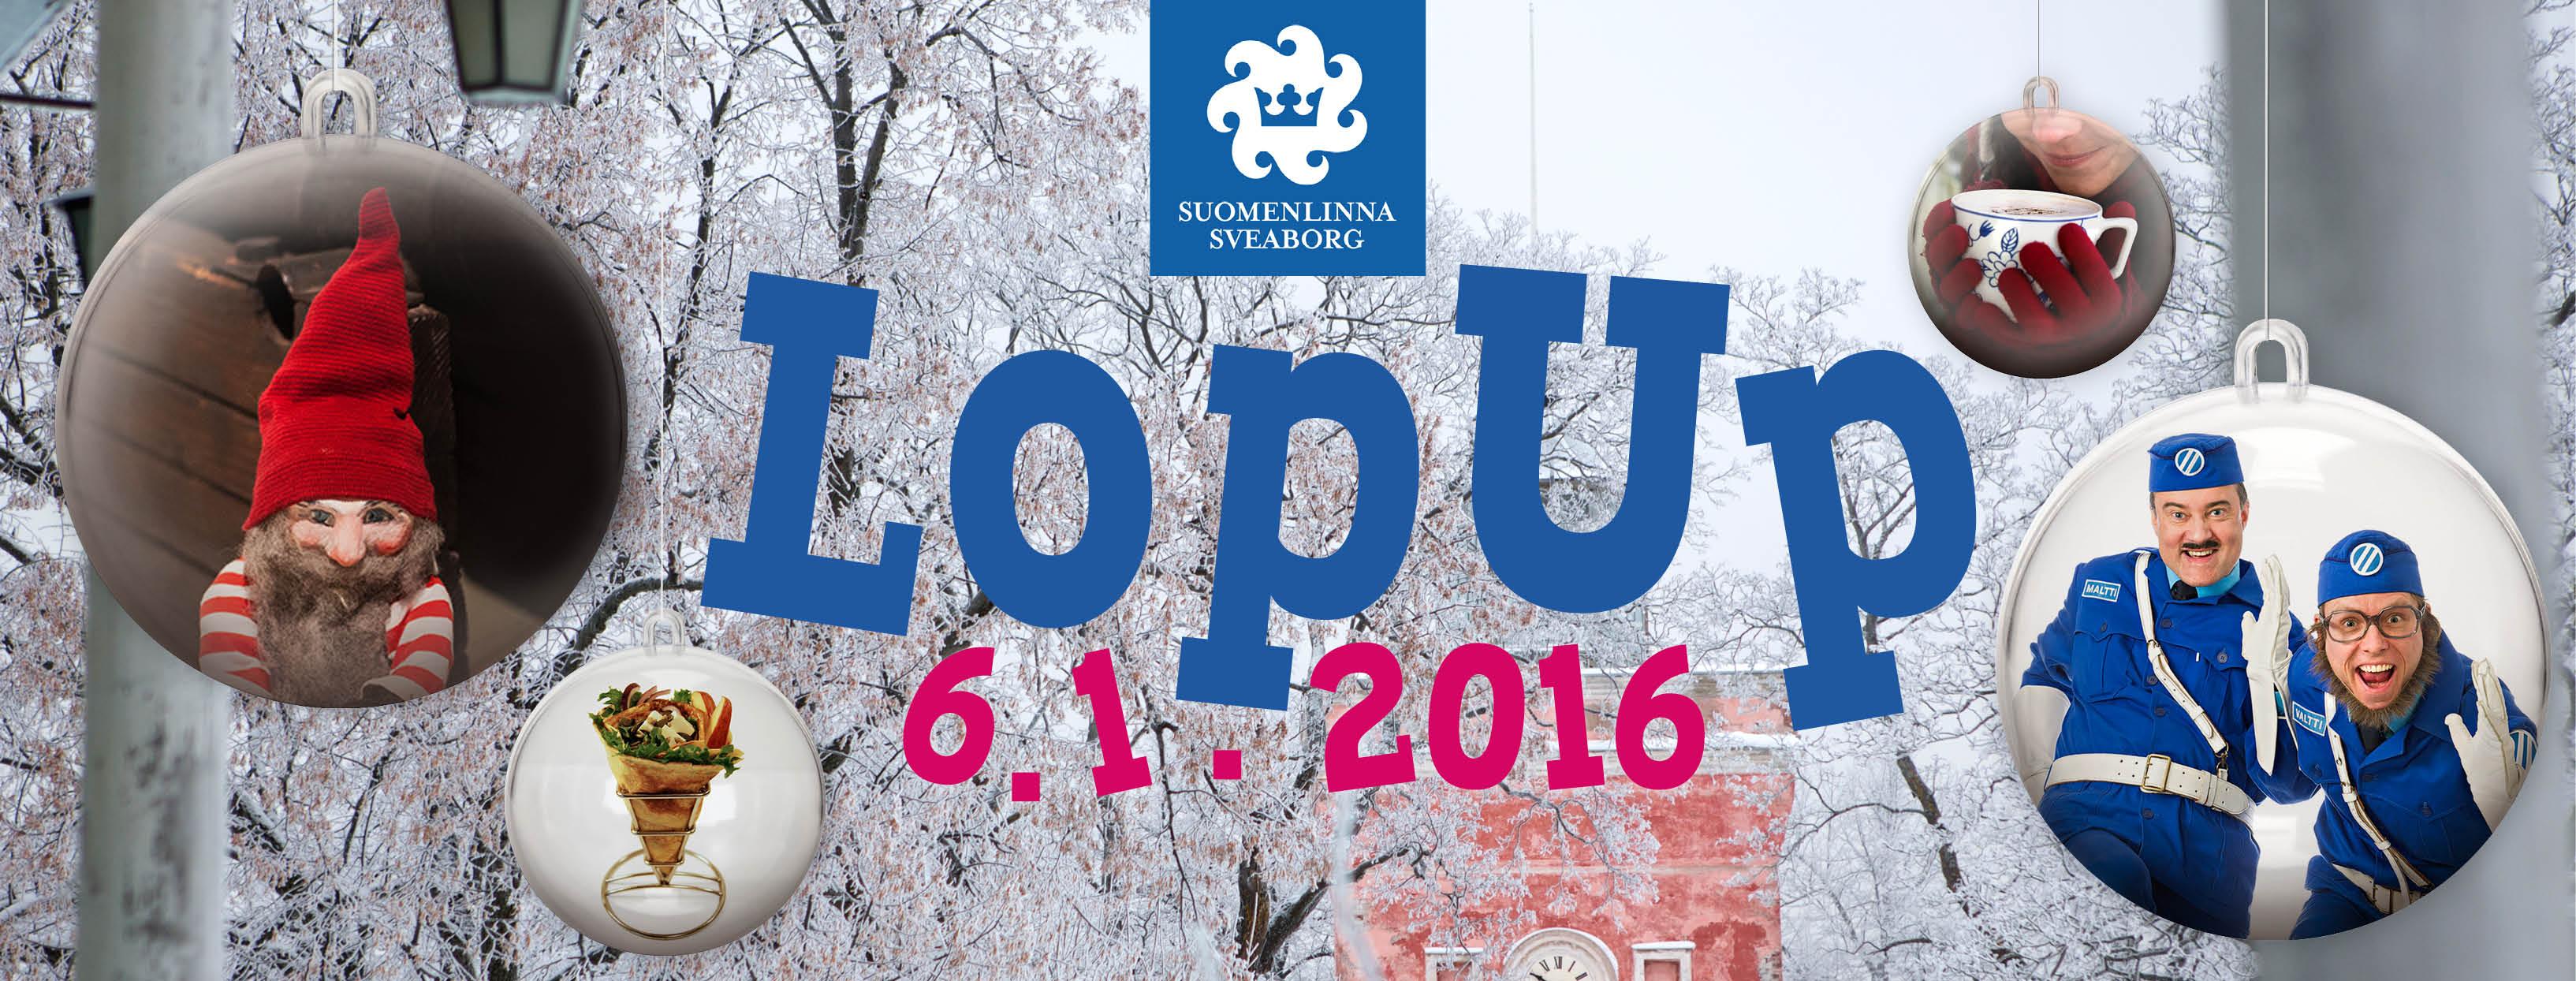 Suomenlinnan LopUp banneri